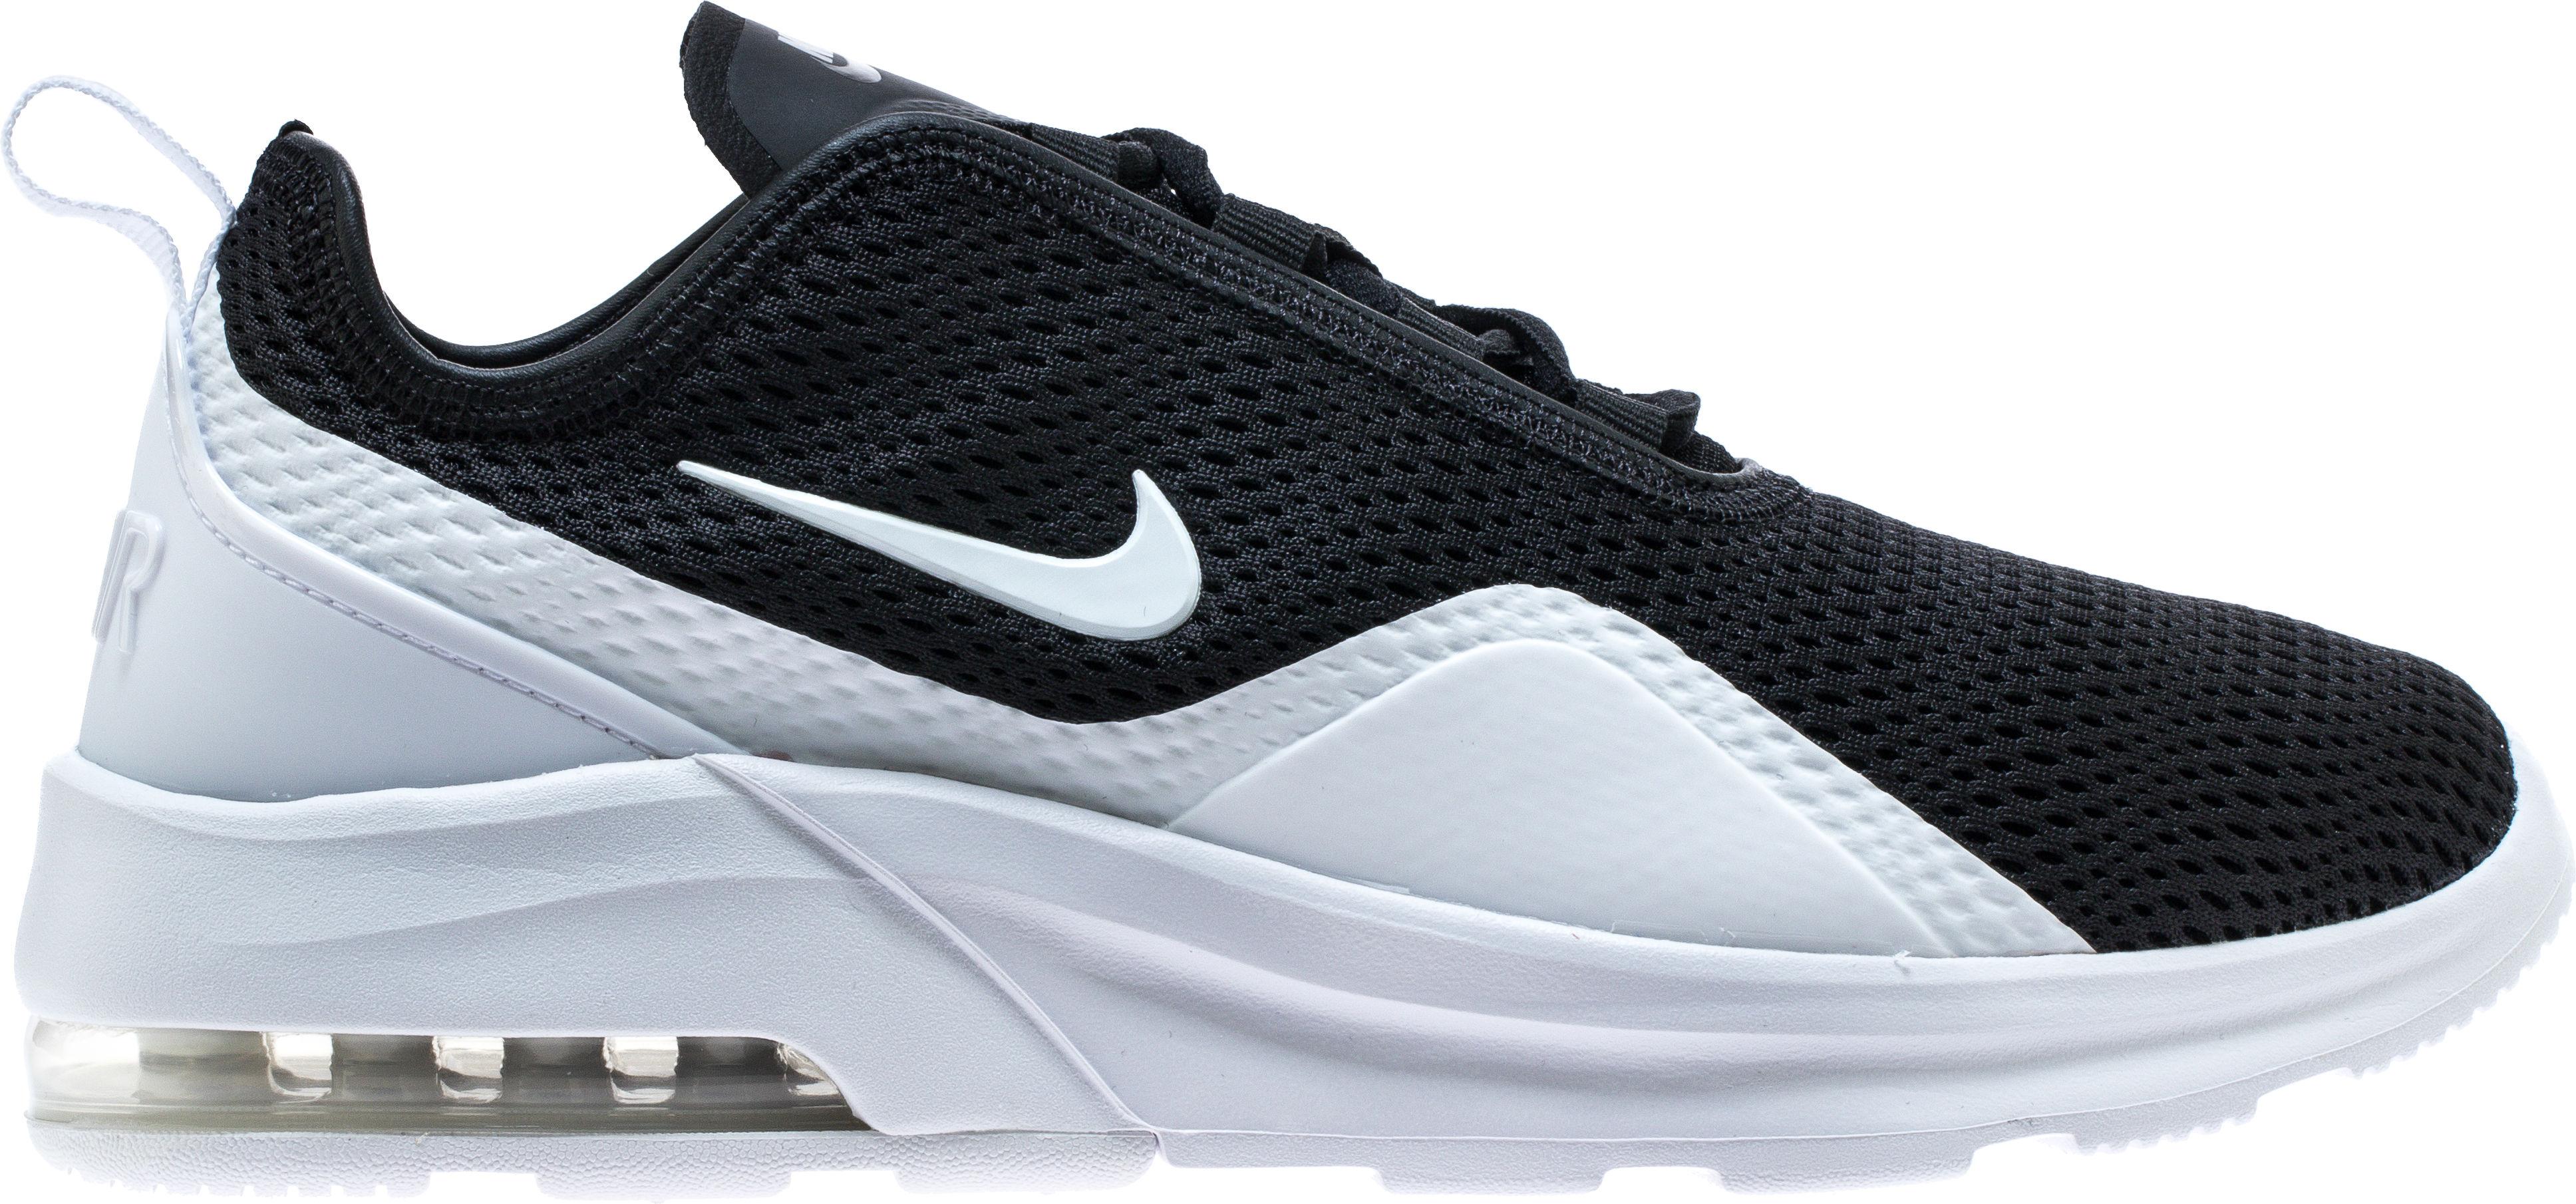 Nike Air Max Motion 2 Black White